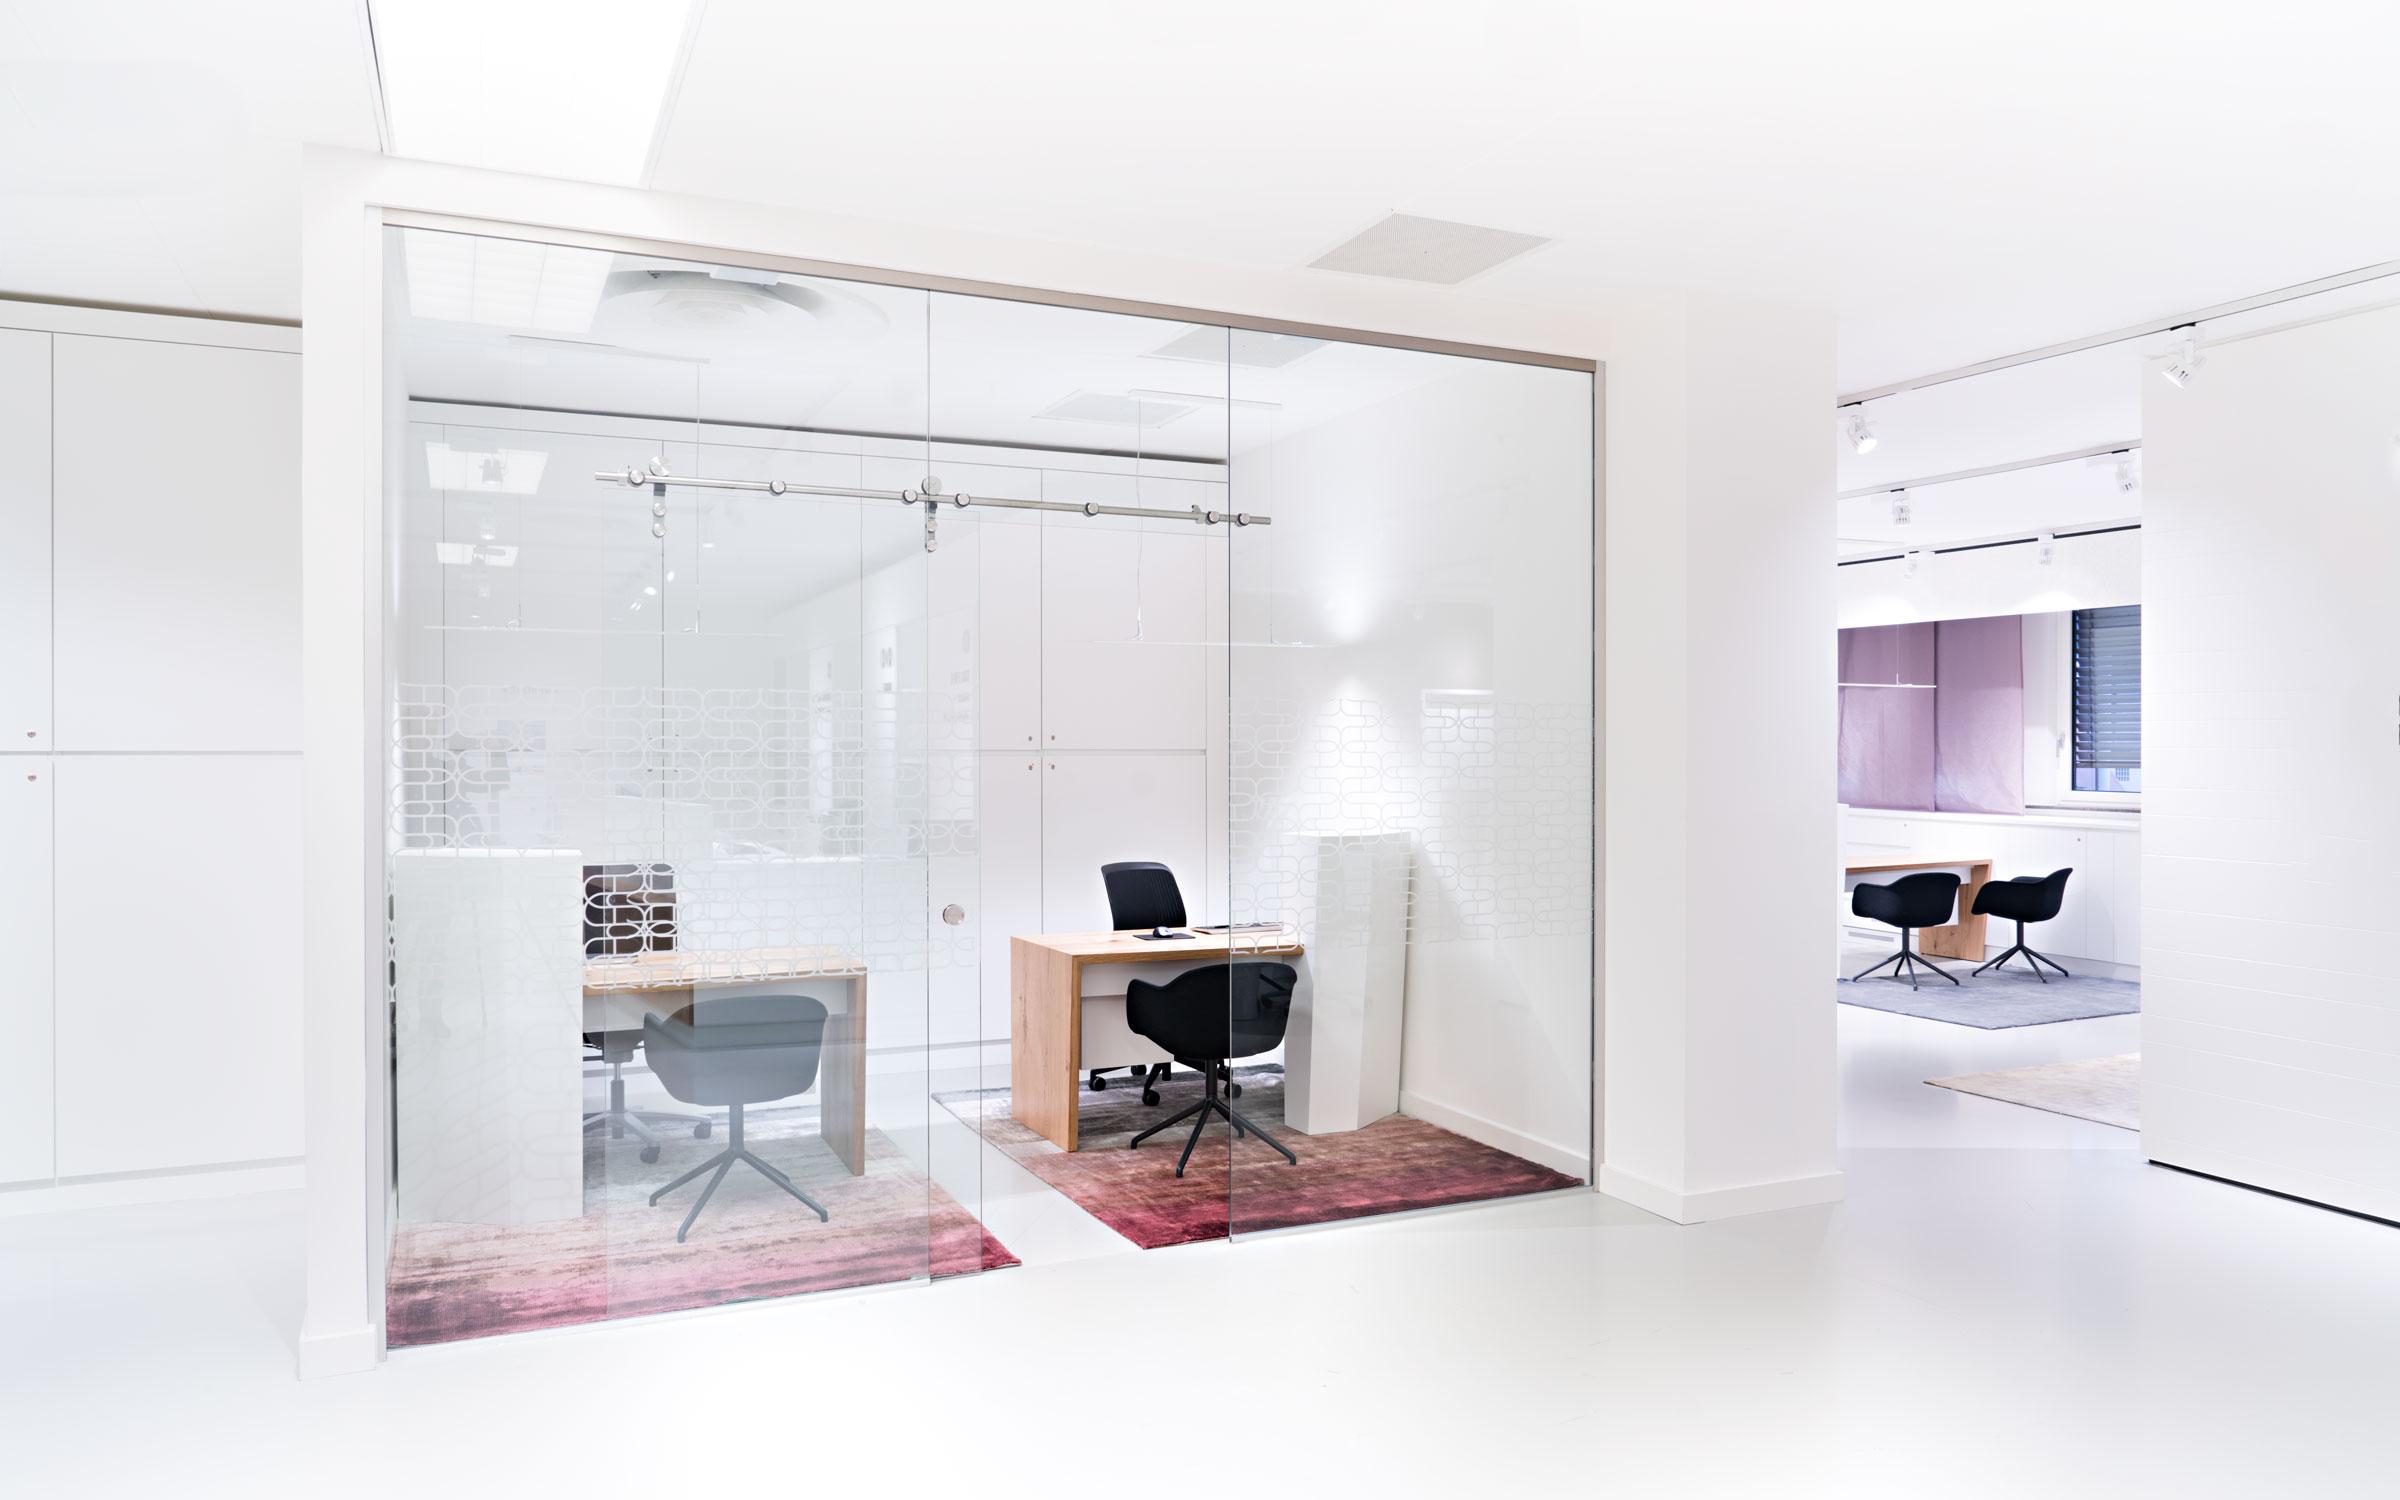 DI-A Kundenzentrum Breuninger